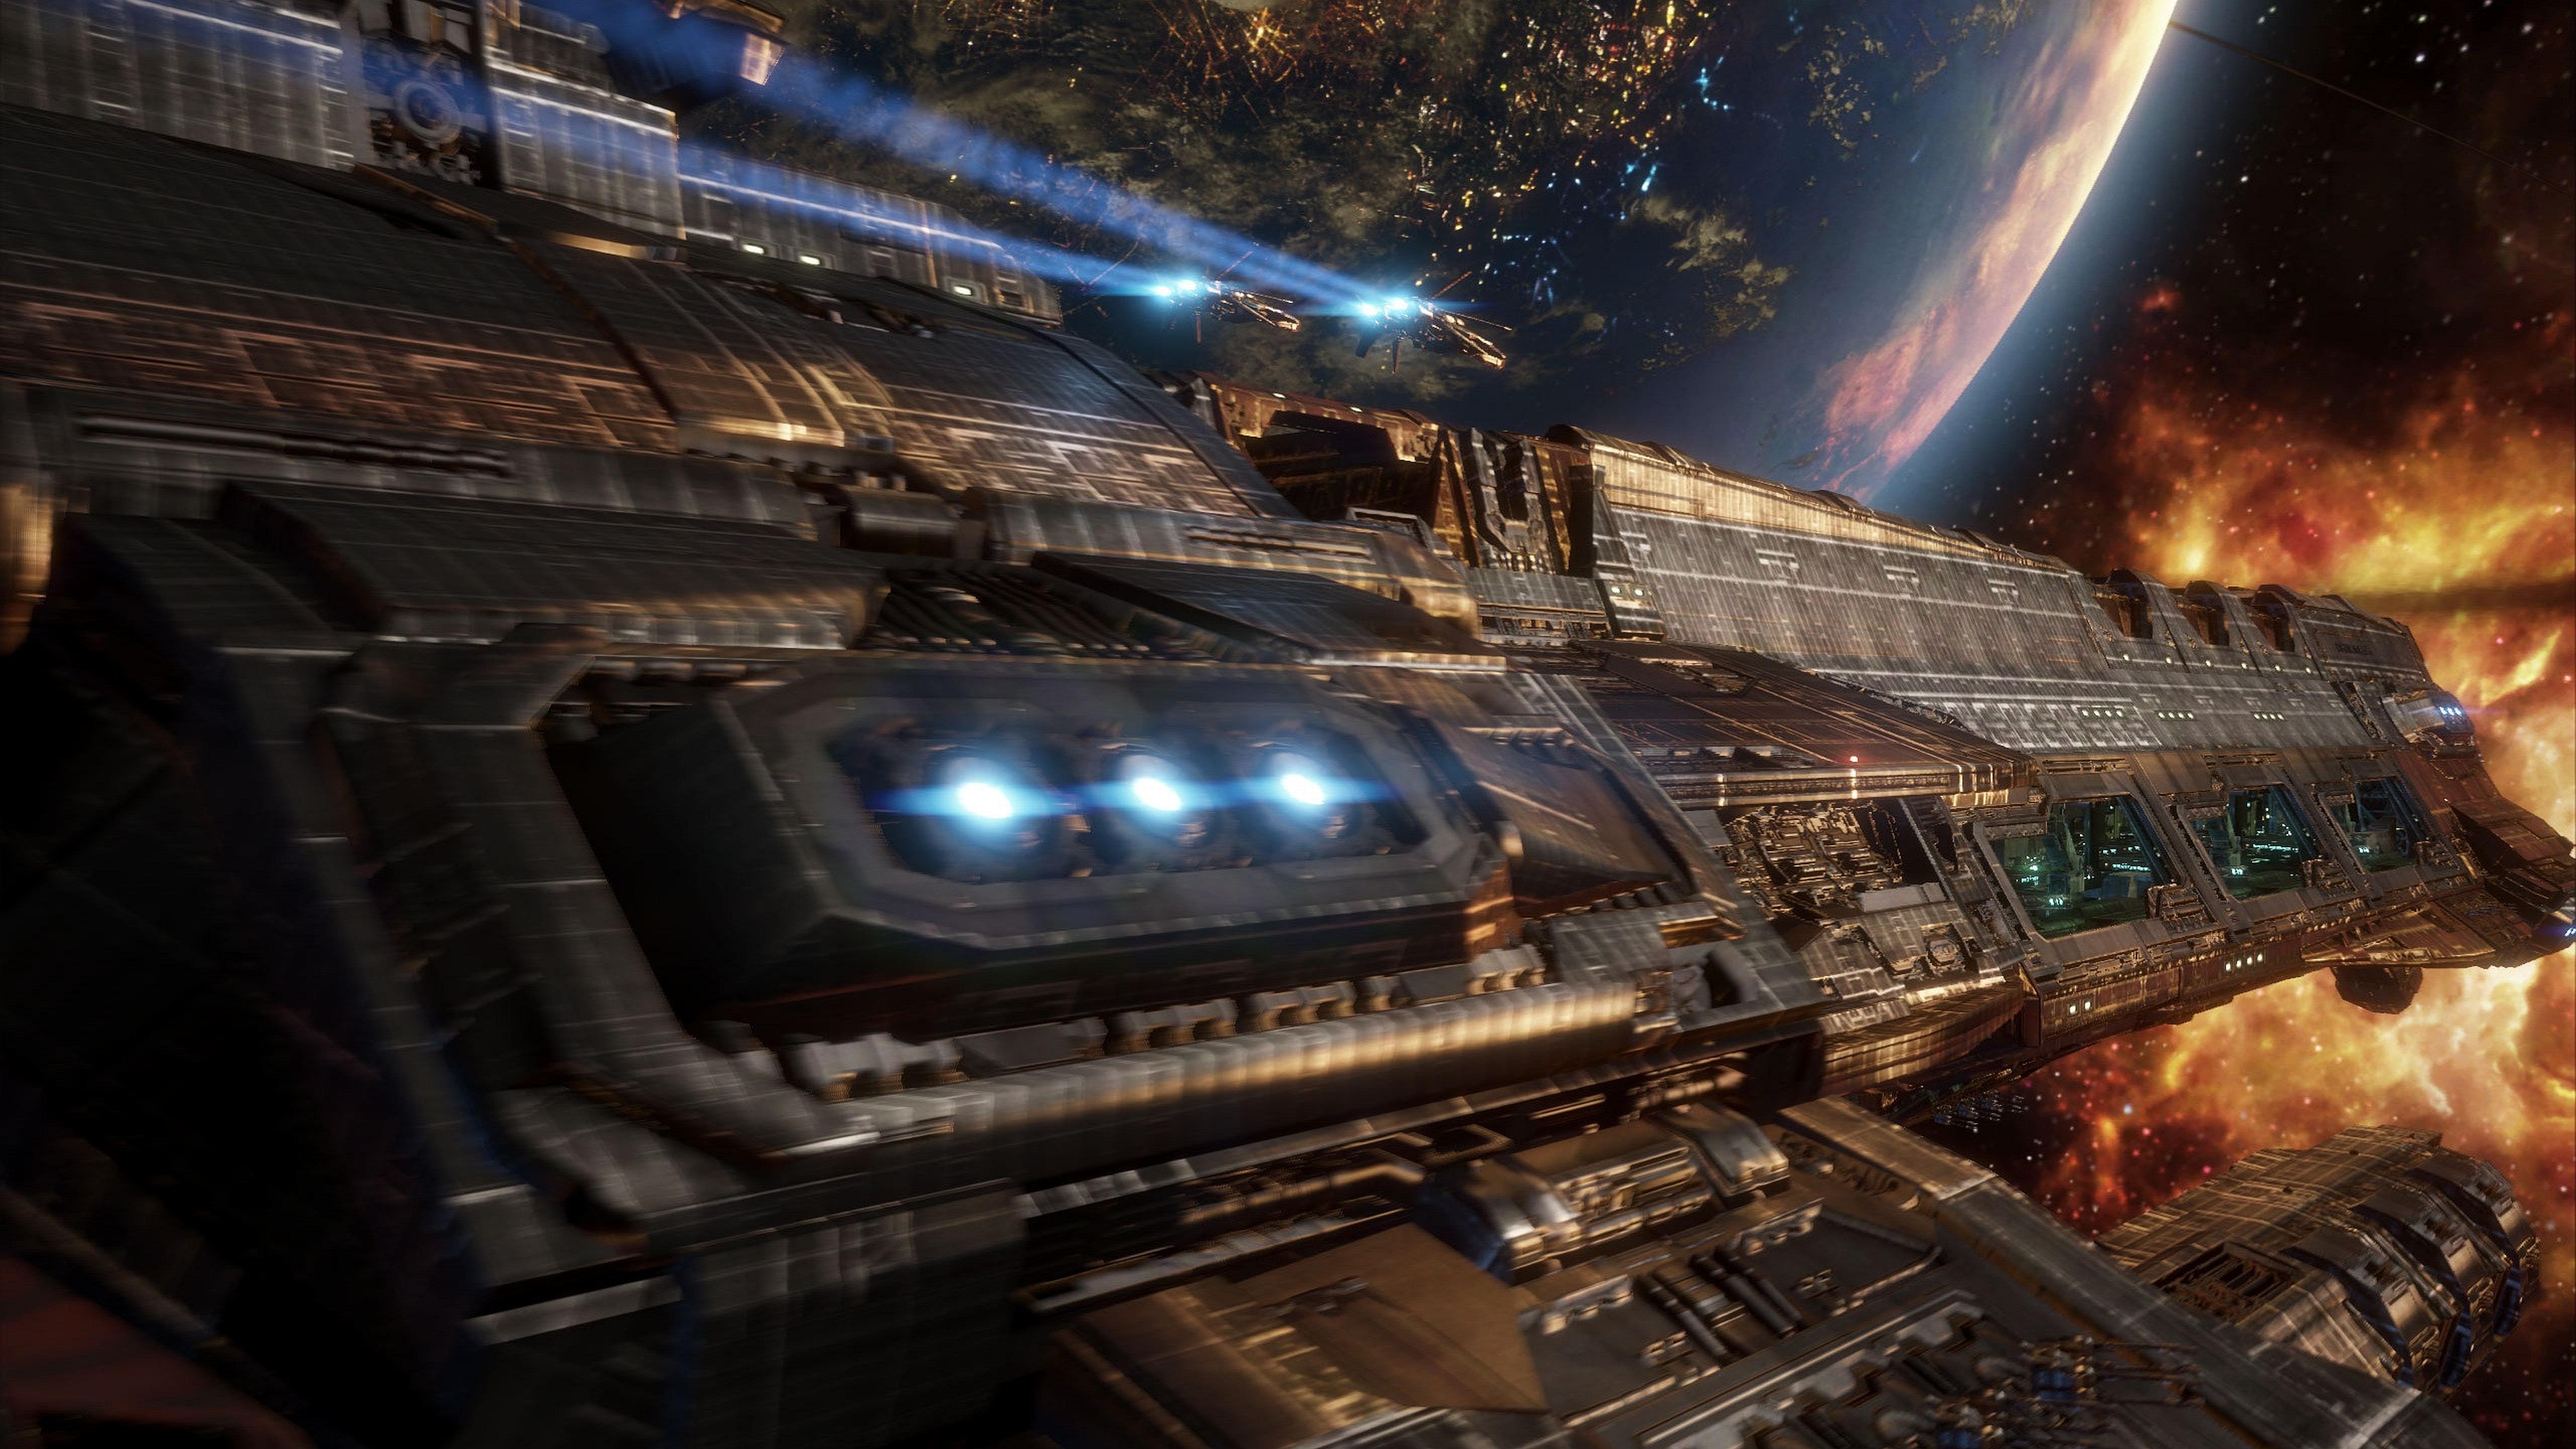 Spaceship 5k retina ultra hd wallpaper and background - Spaceship wallpaper ...